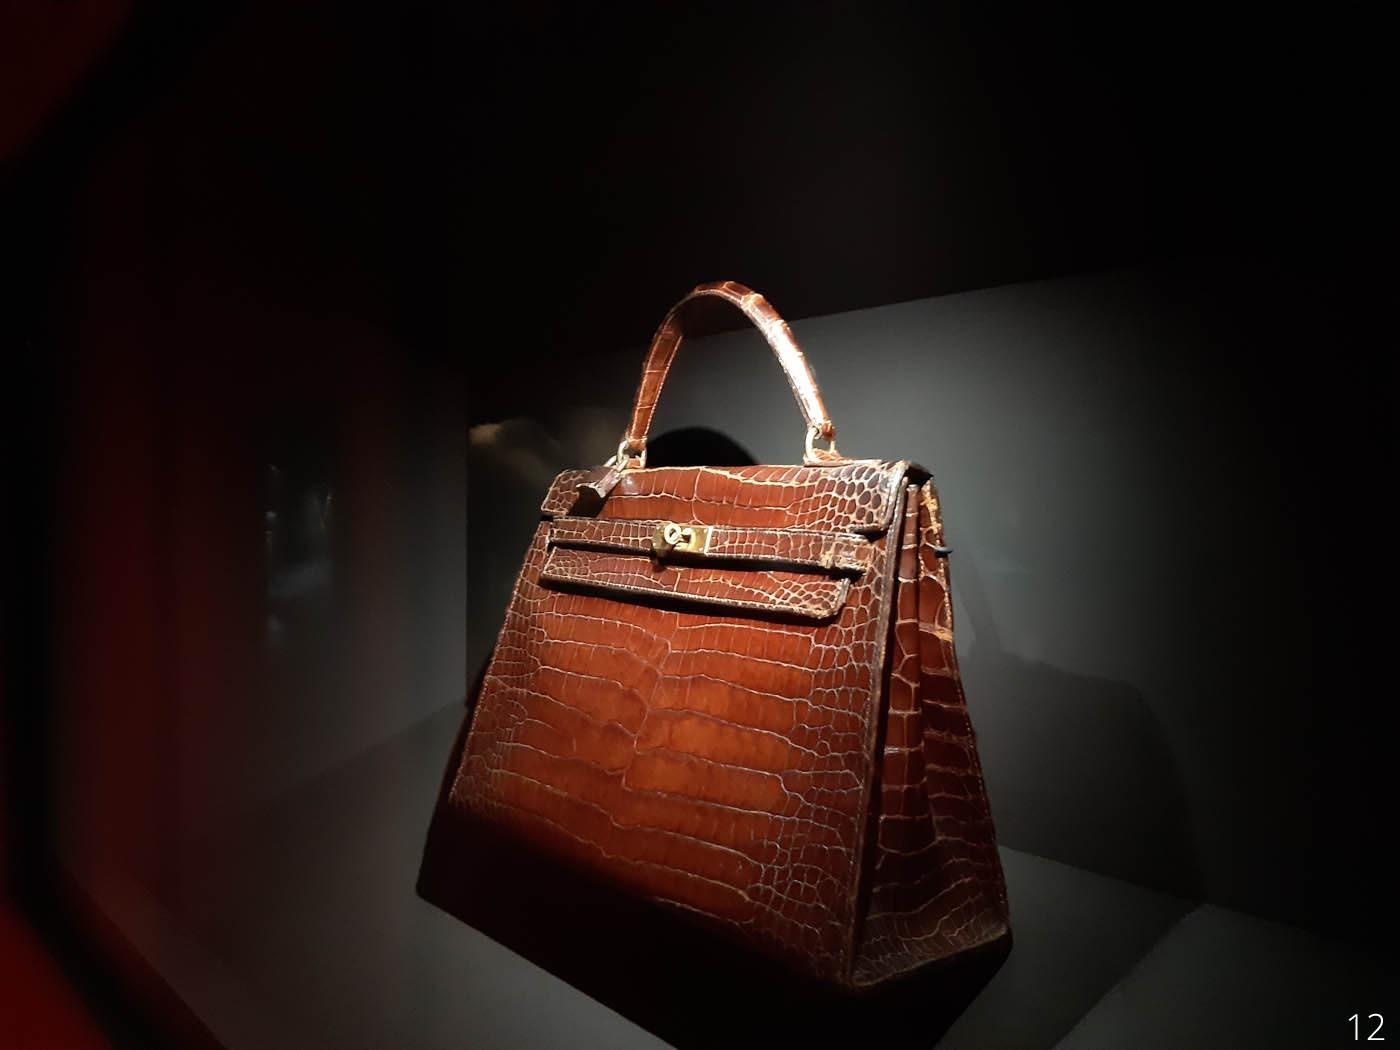 LUXES-_-MAD_B-14-Sac-Kelly-Hermès